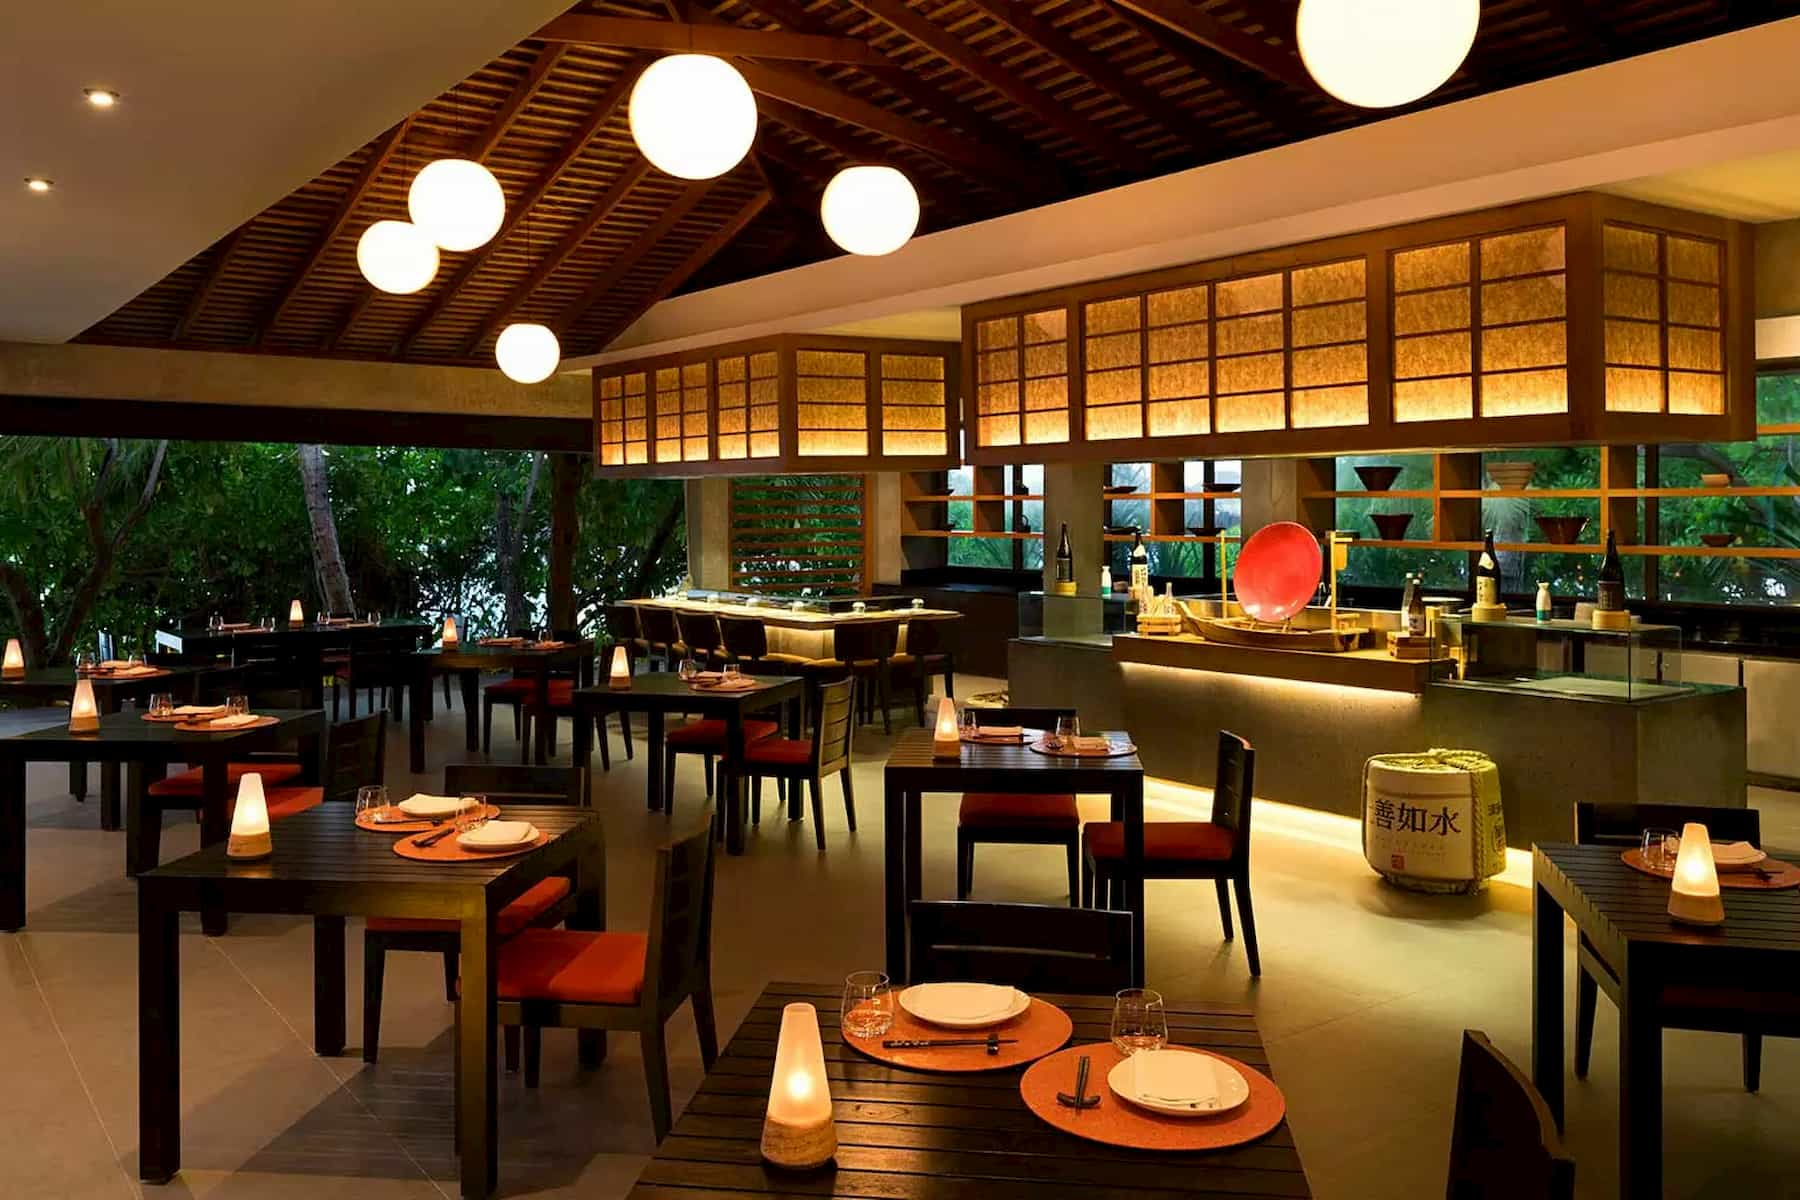 Anantara Dhigu resort Maldive Origami cucina giapponese